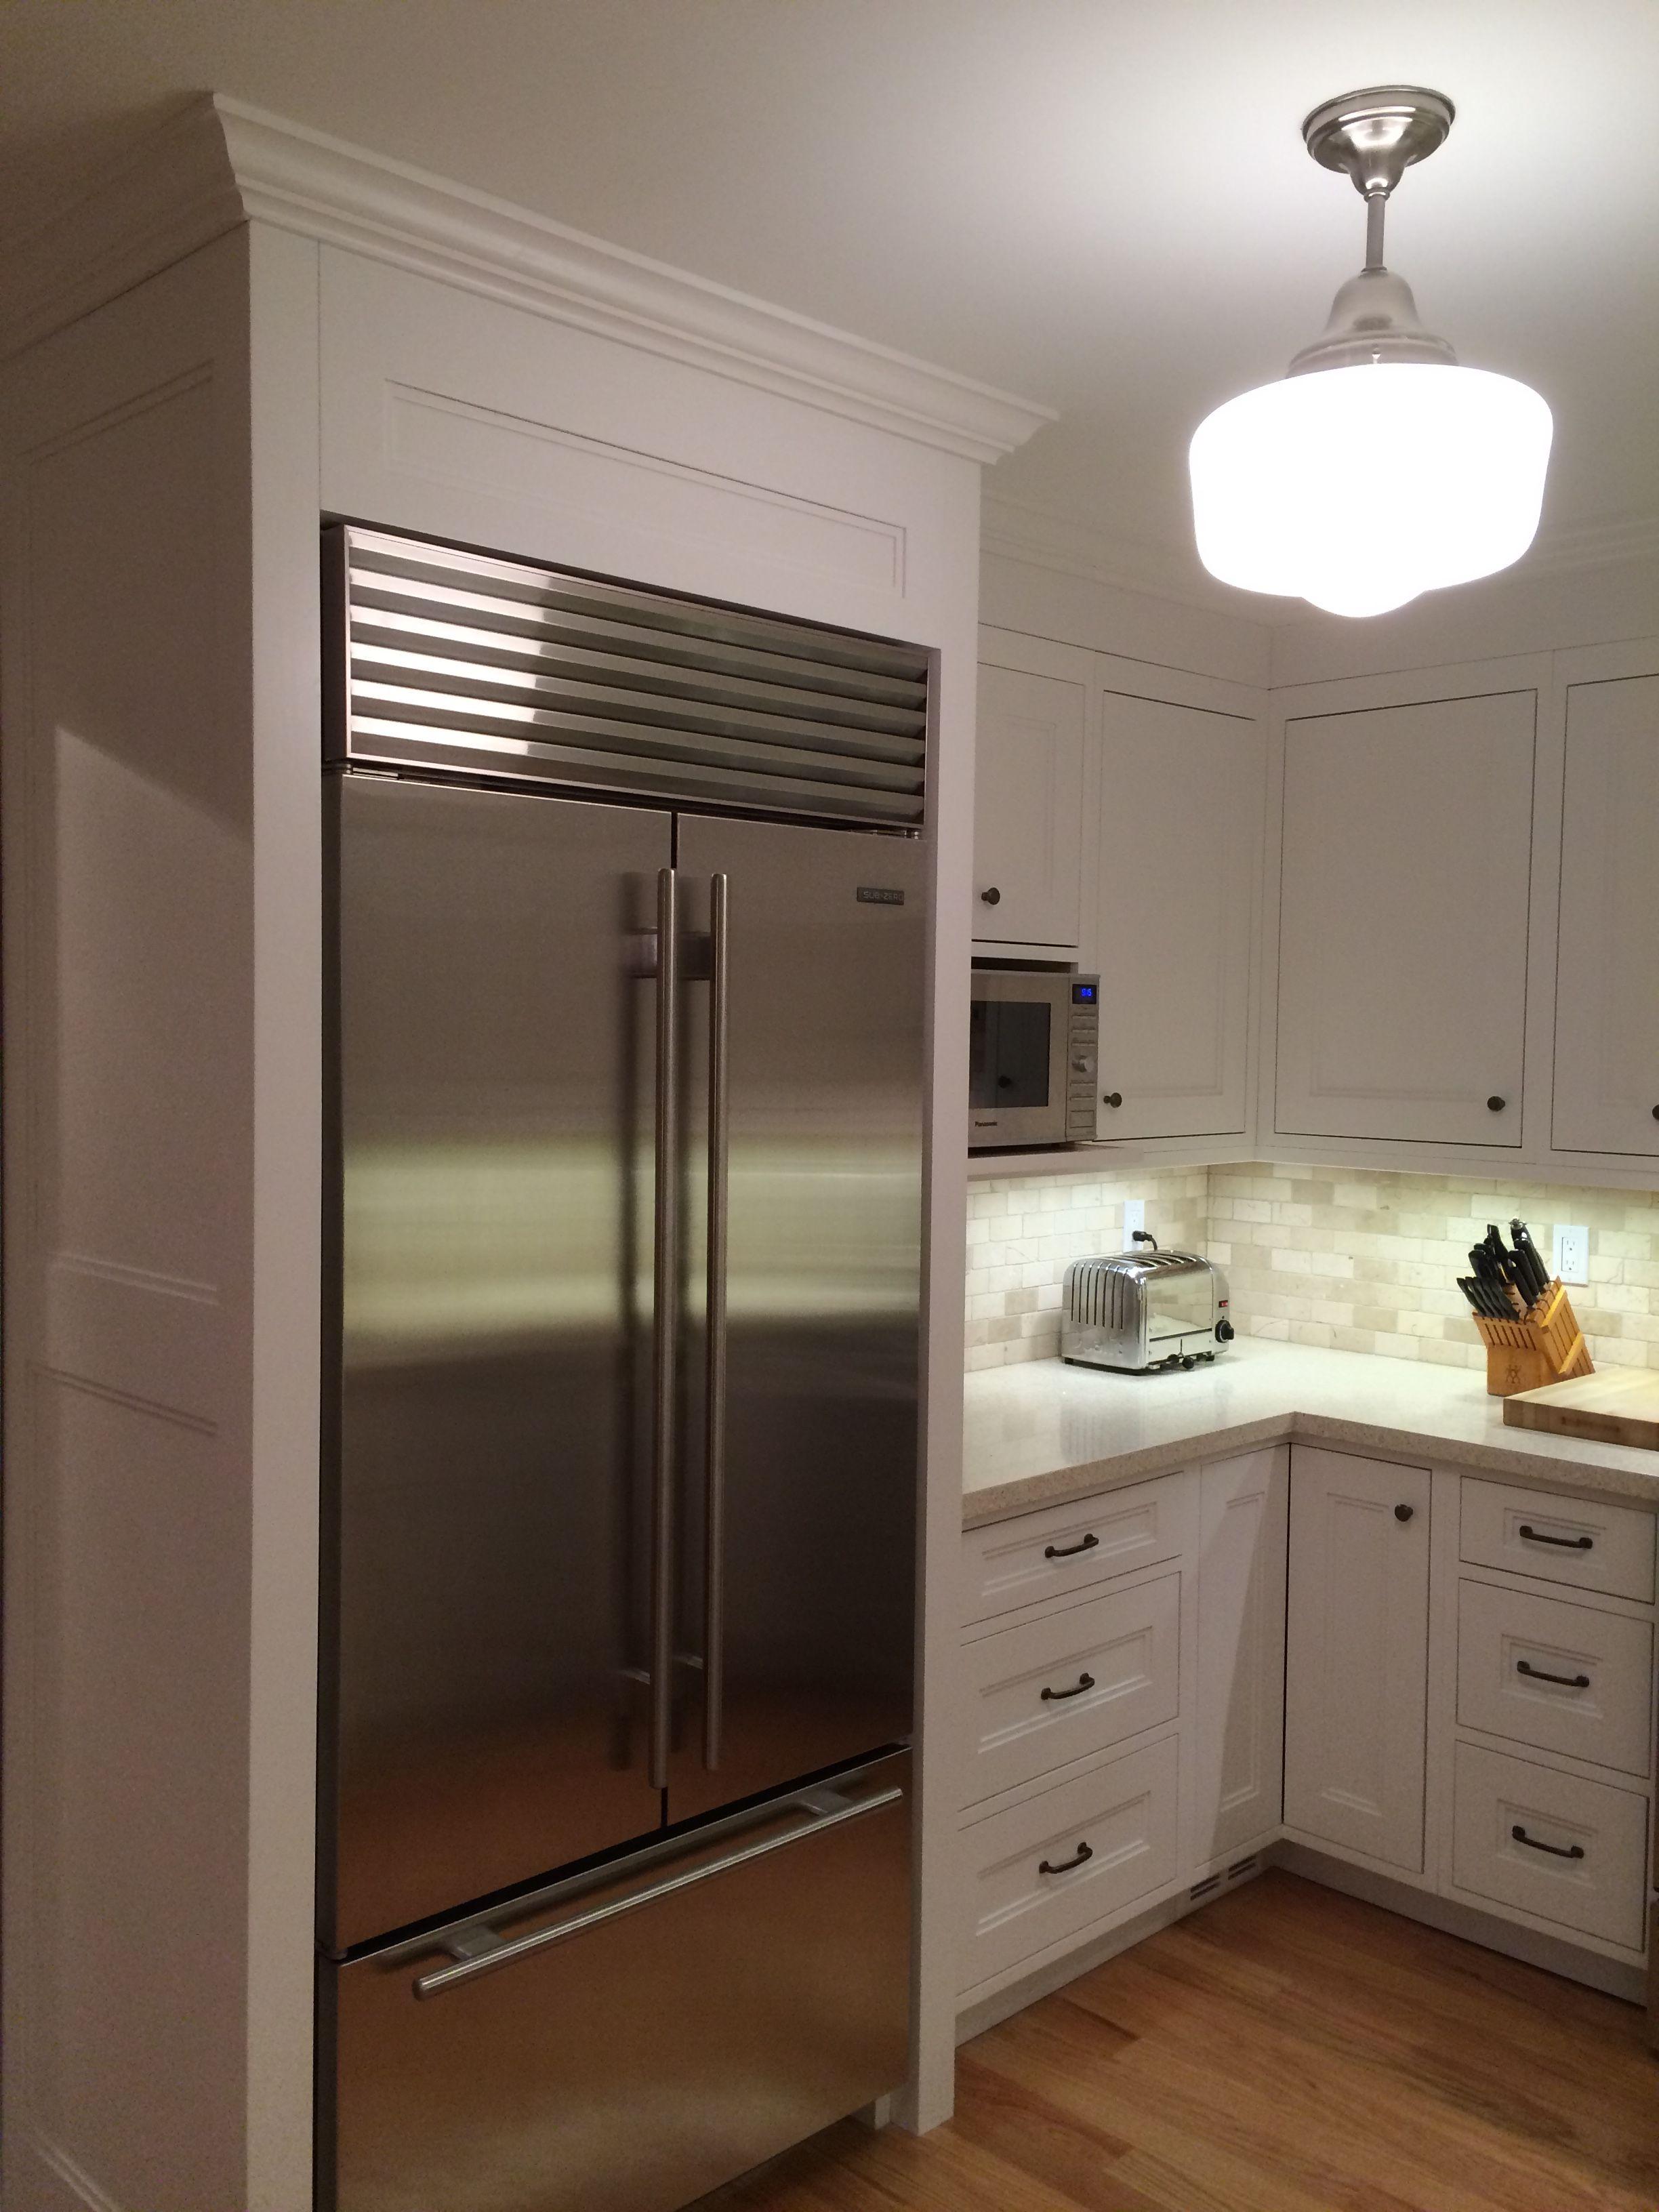 Heritage Carpentry Company Built In Fridge Surround Kitchen Redecorating Kitchen Remodel Kitchen Inspirations